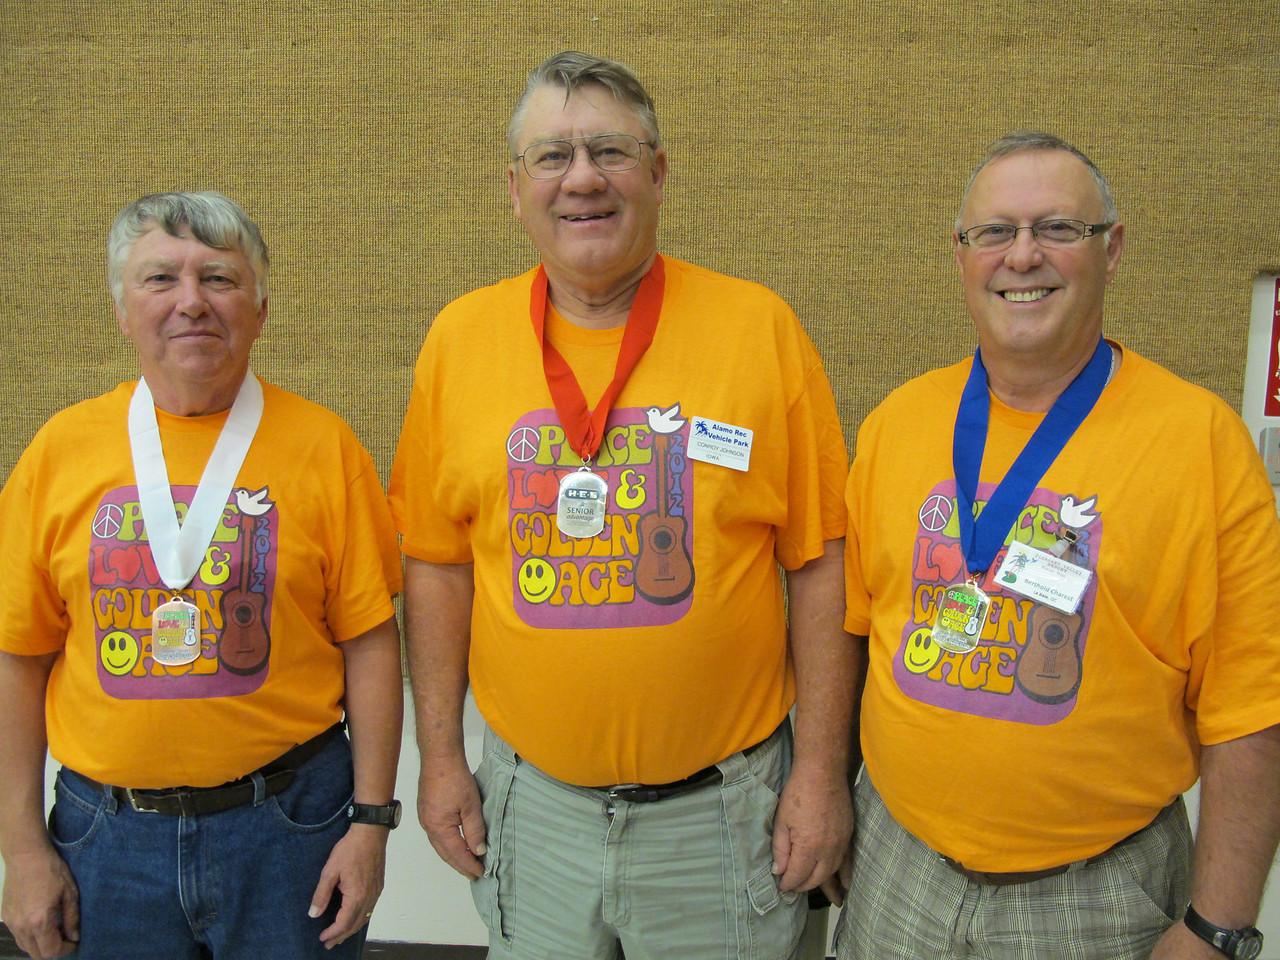 Men's Cribbage 3rd - 1st Place (L-R): Jack Halpin, Conray Johnson, Berthold Charest